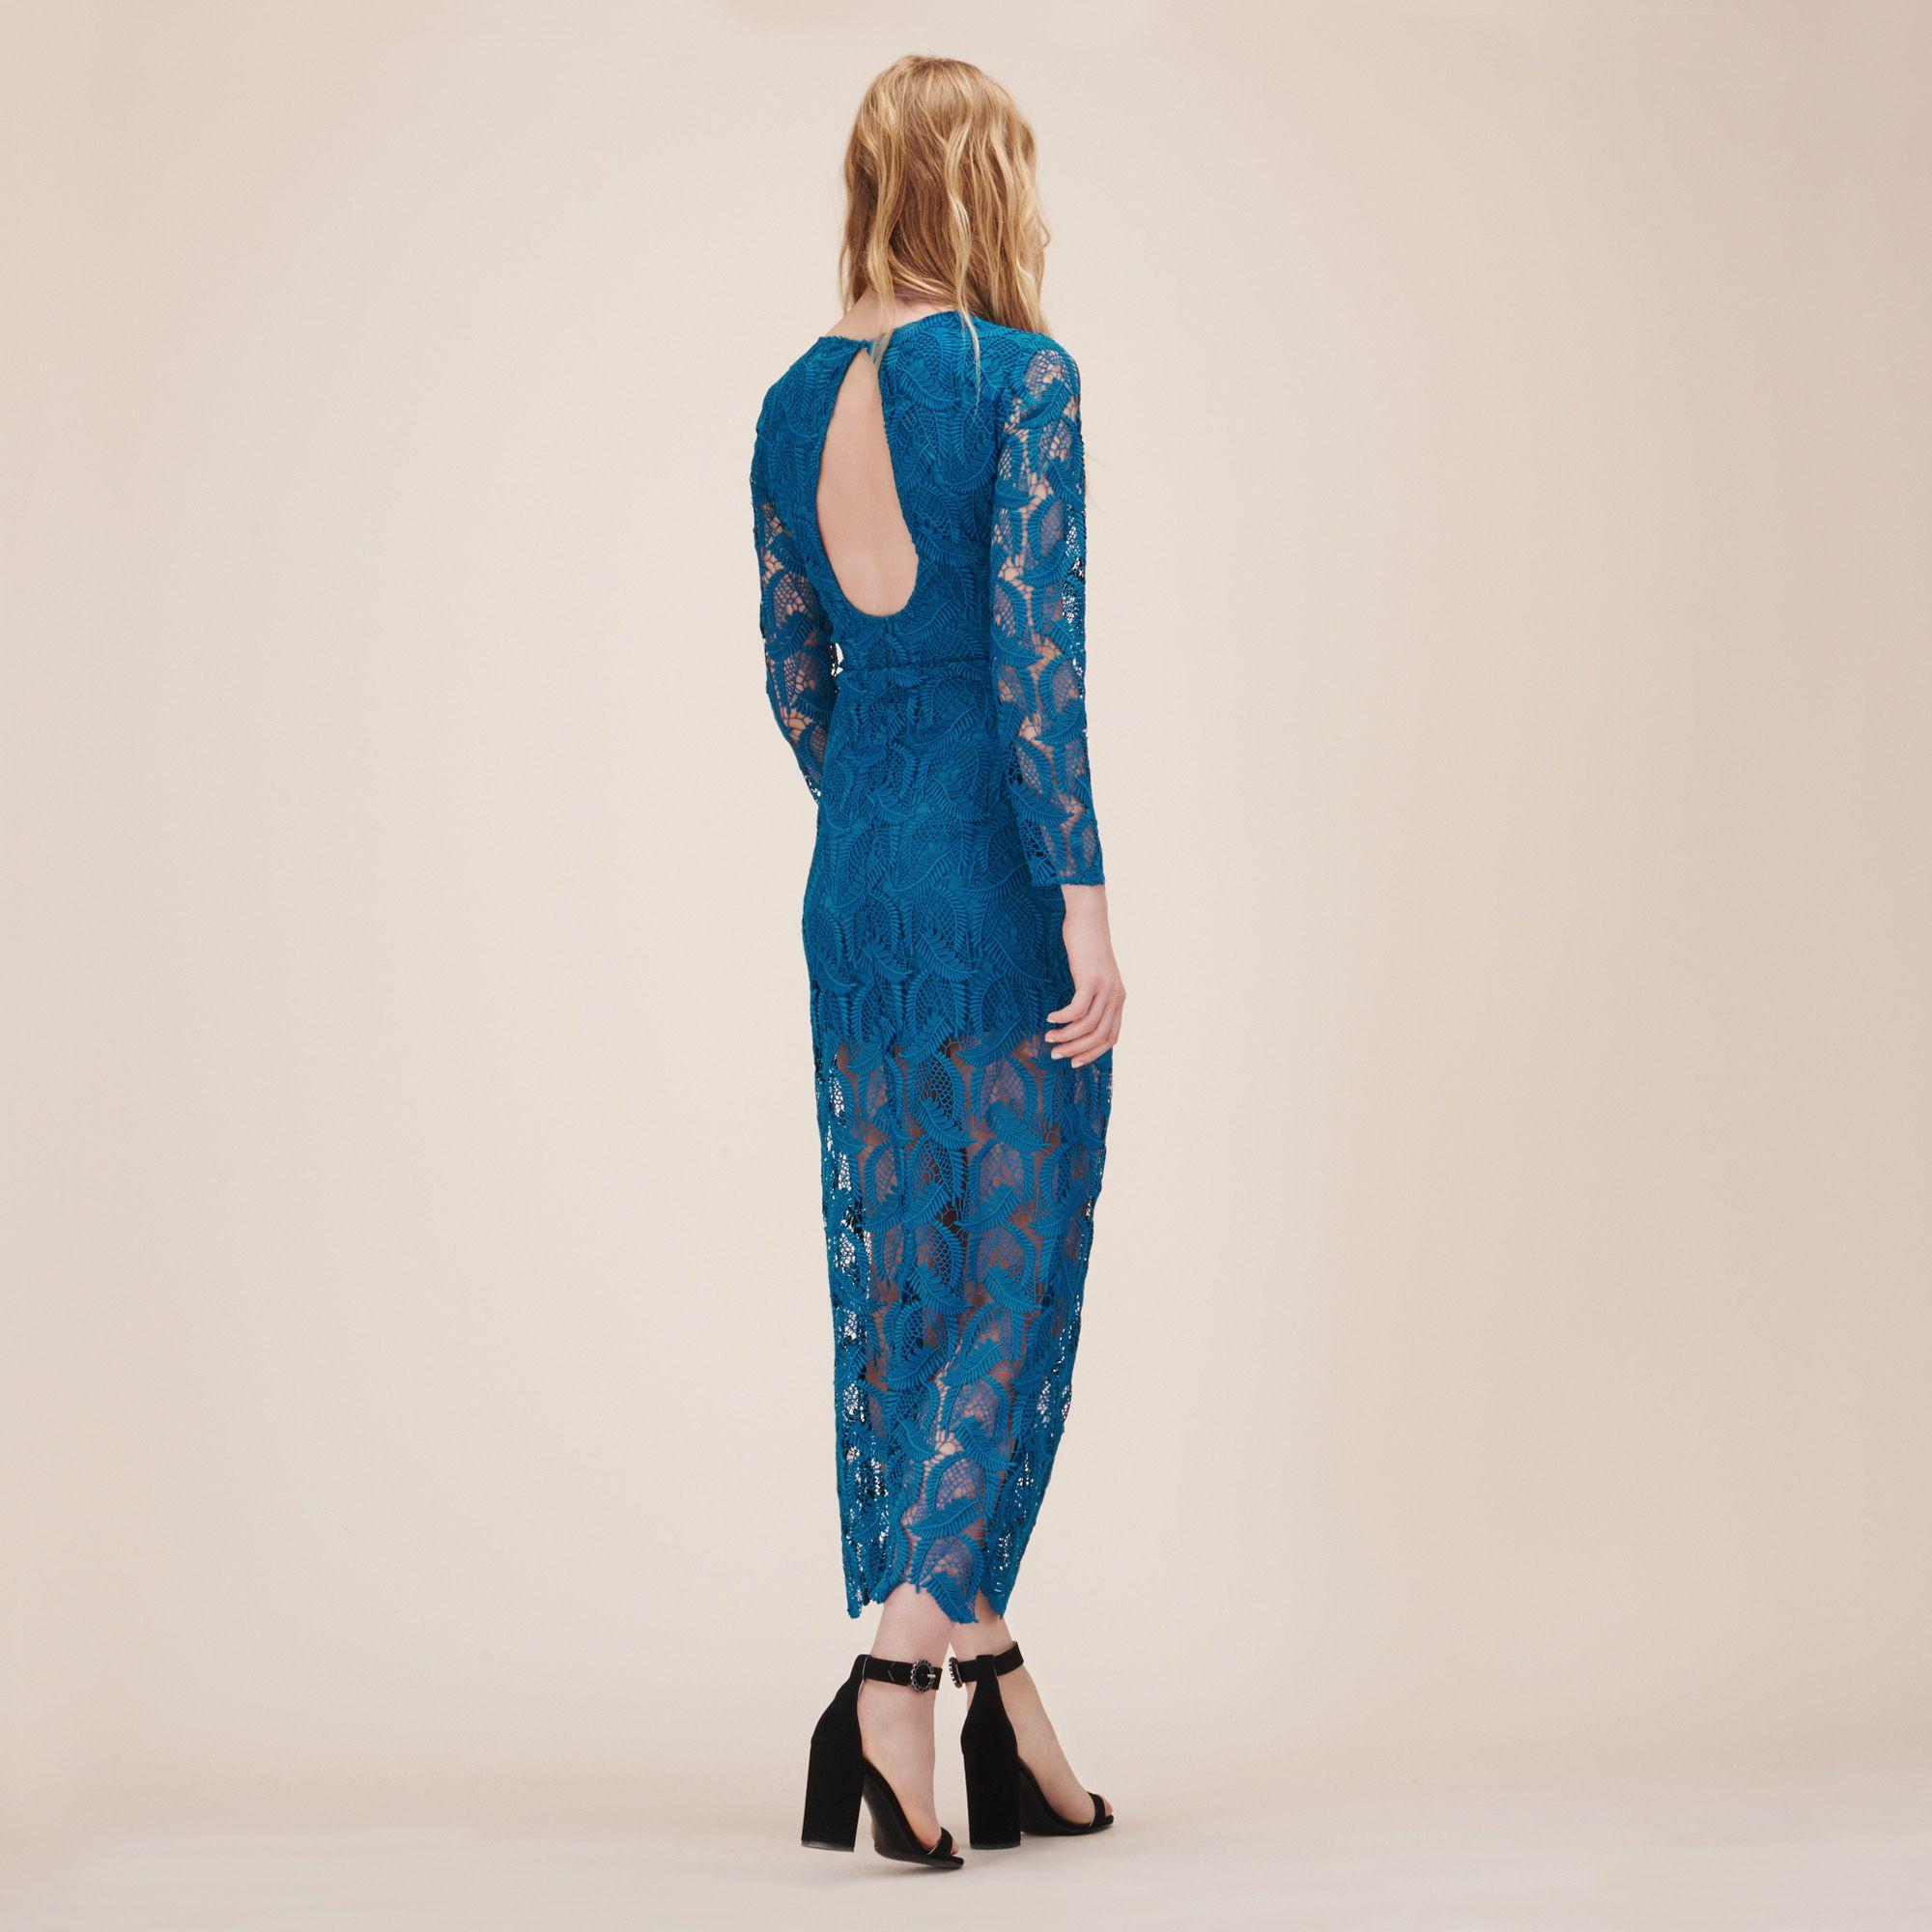 Maje ROSANE dress; long patterned lace dress